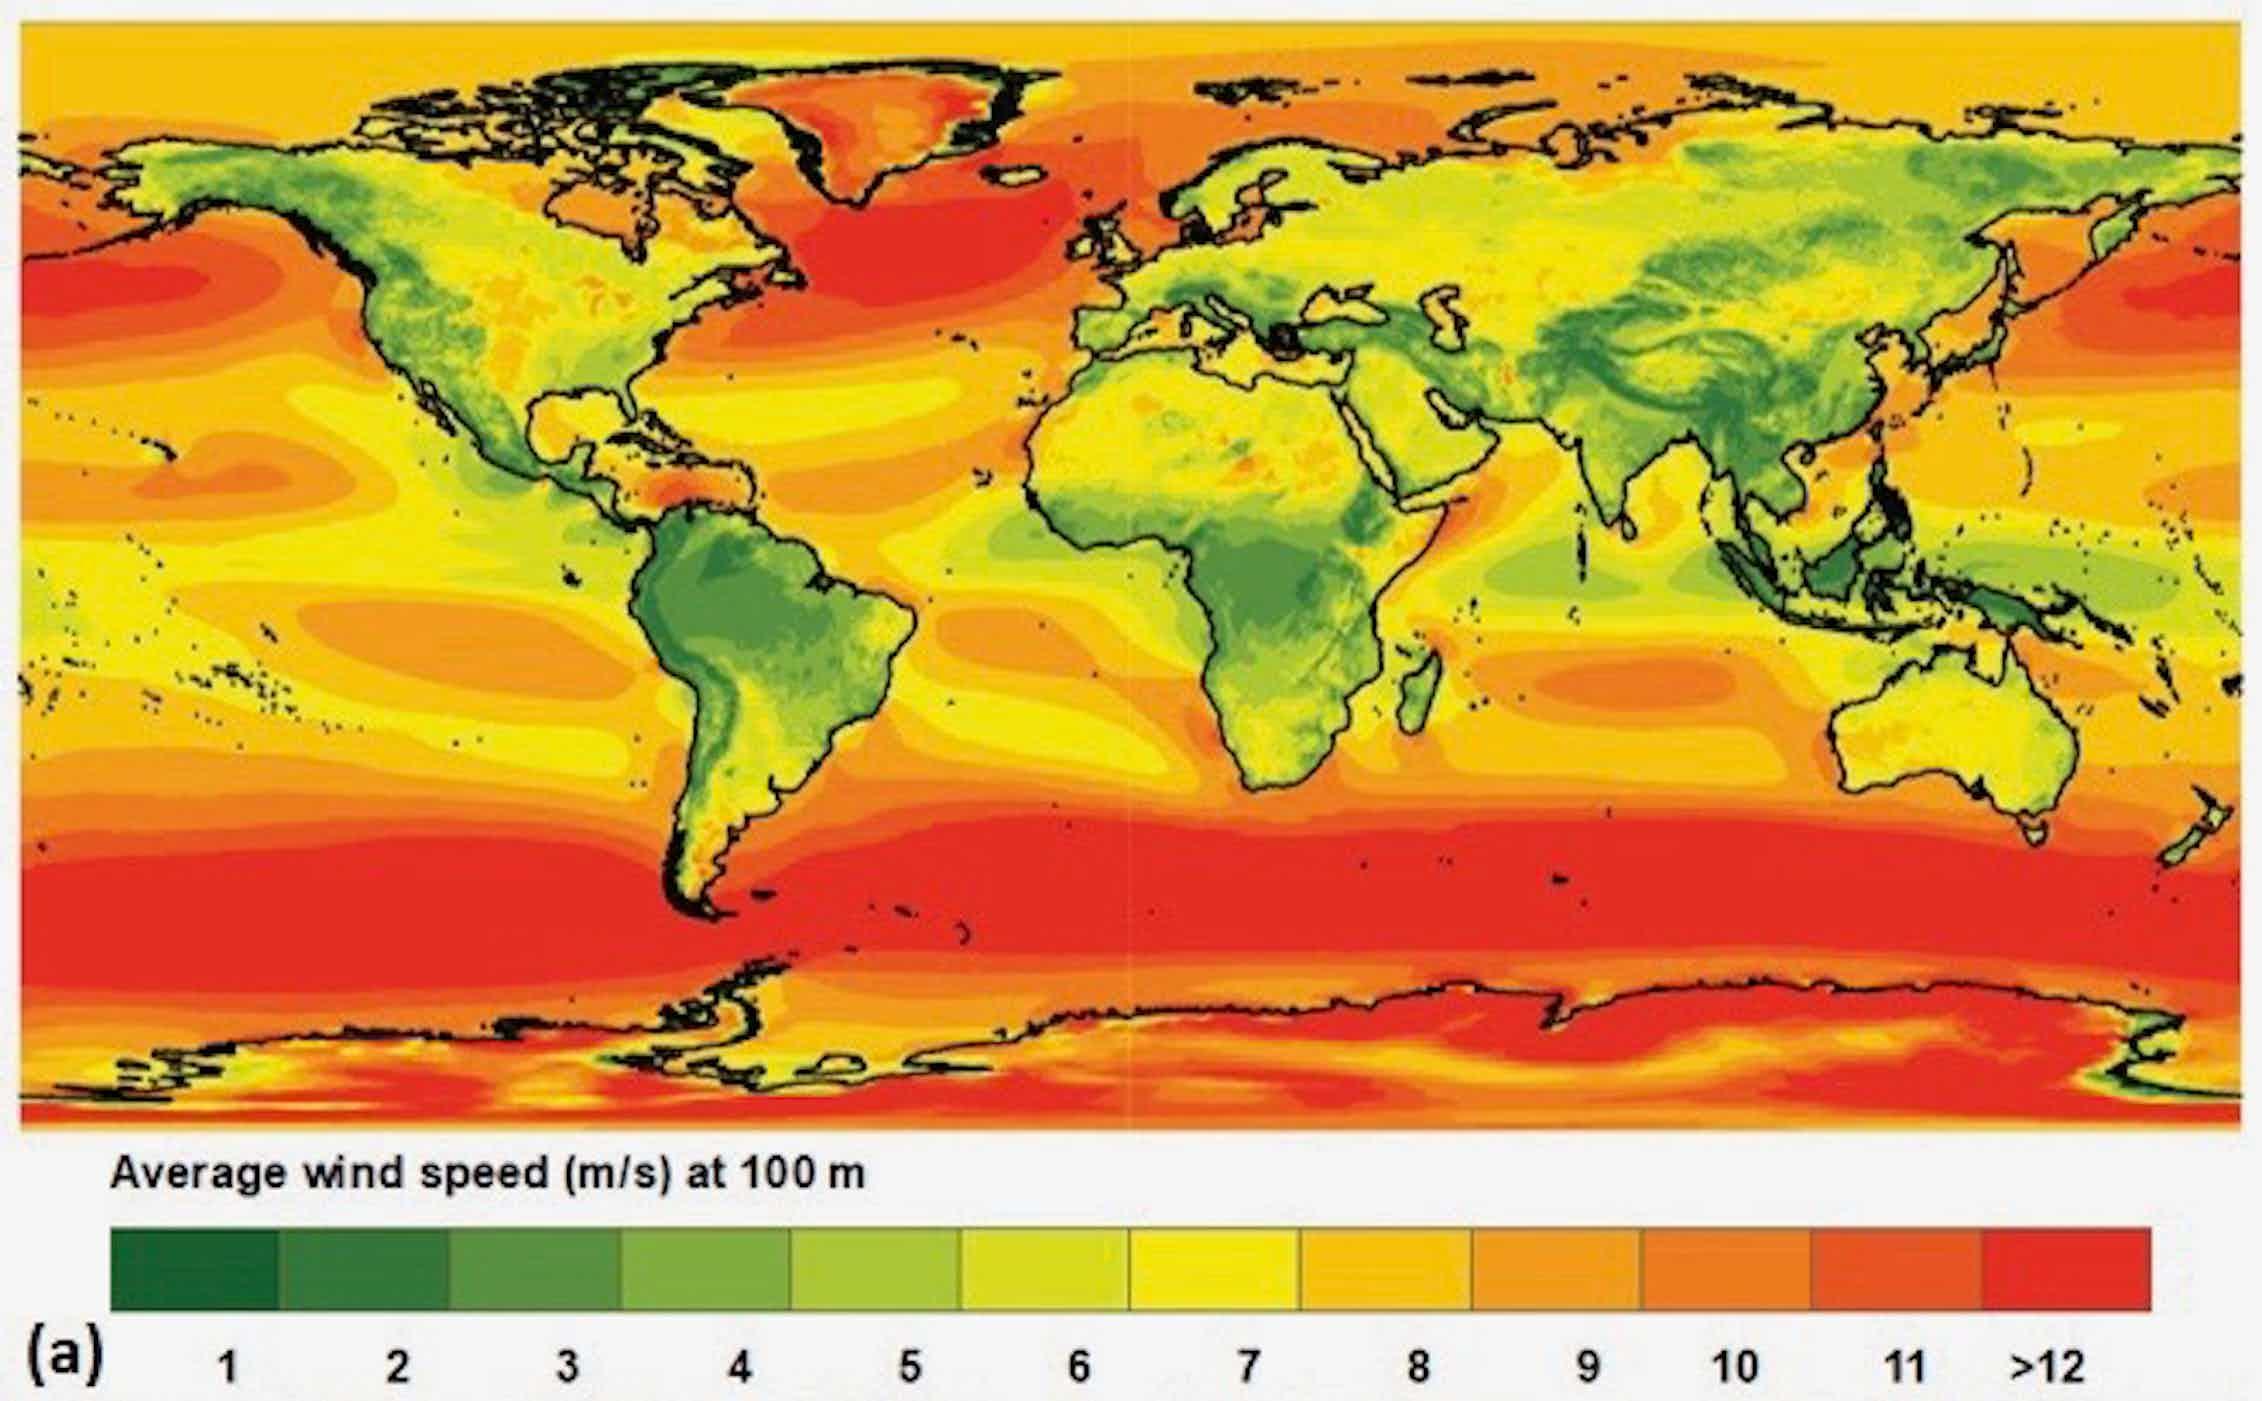 Global average wind speed